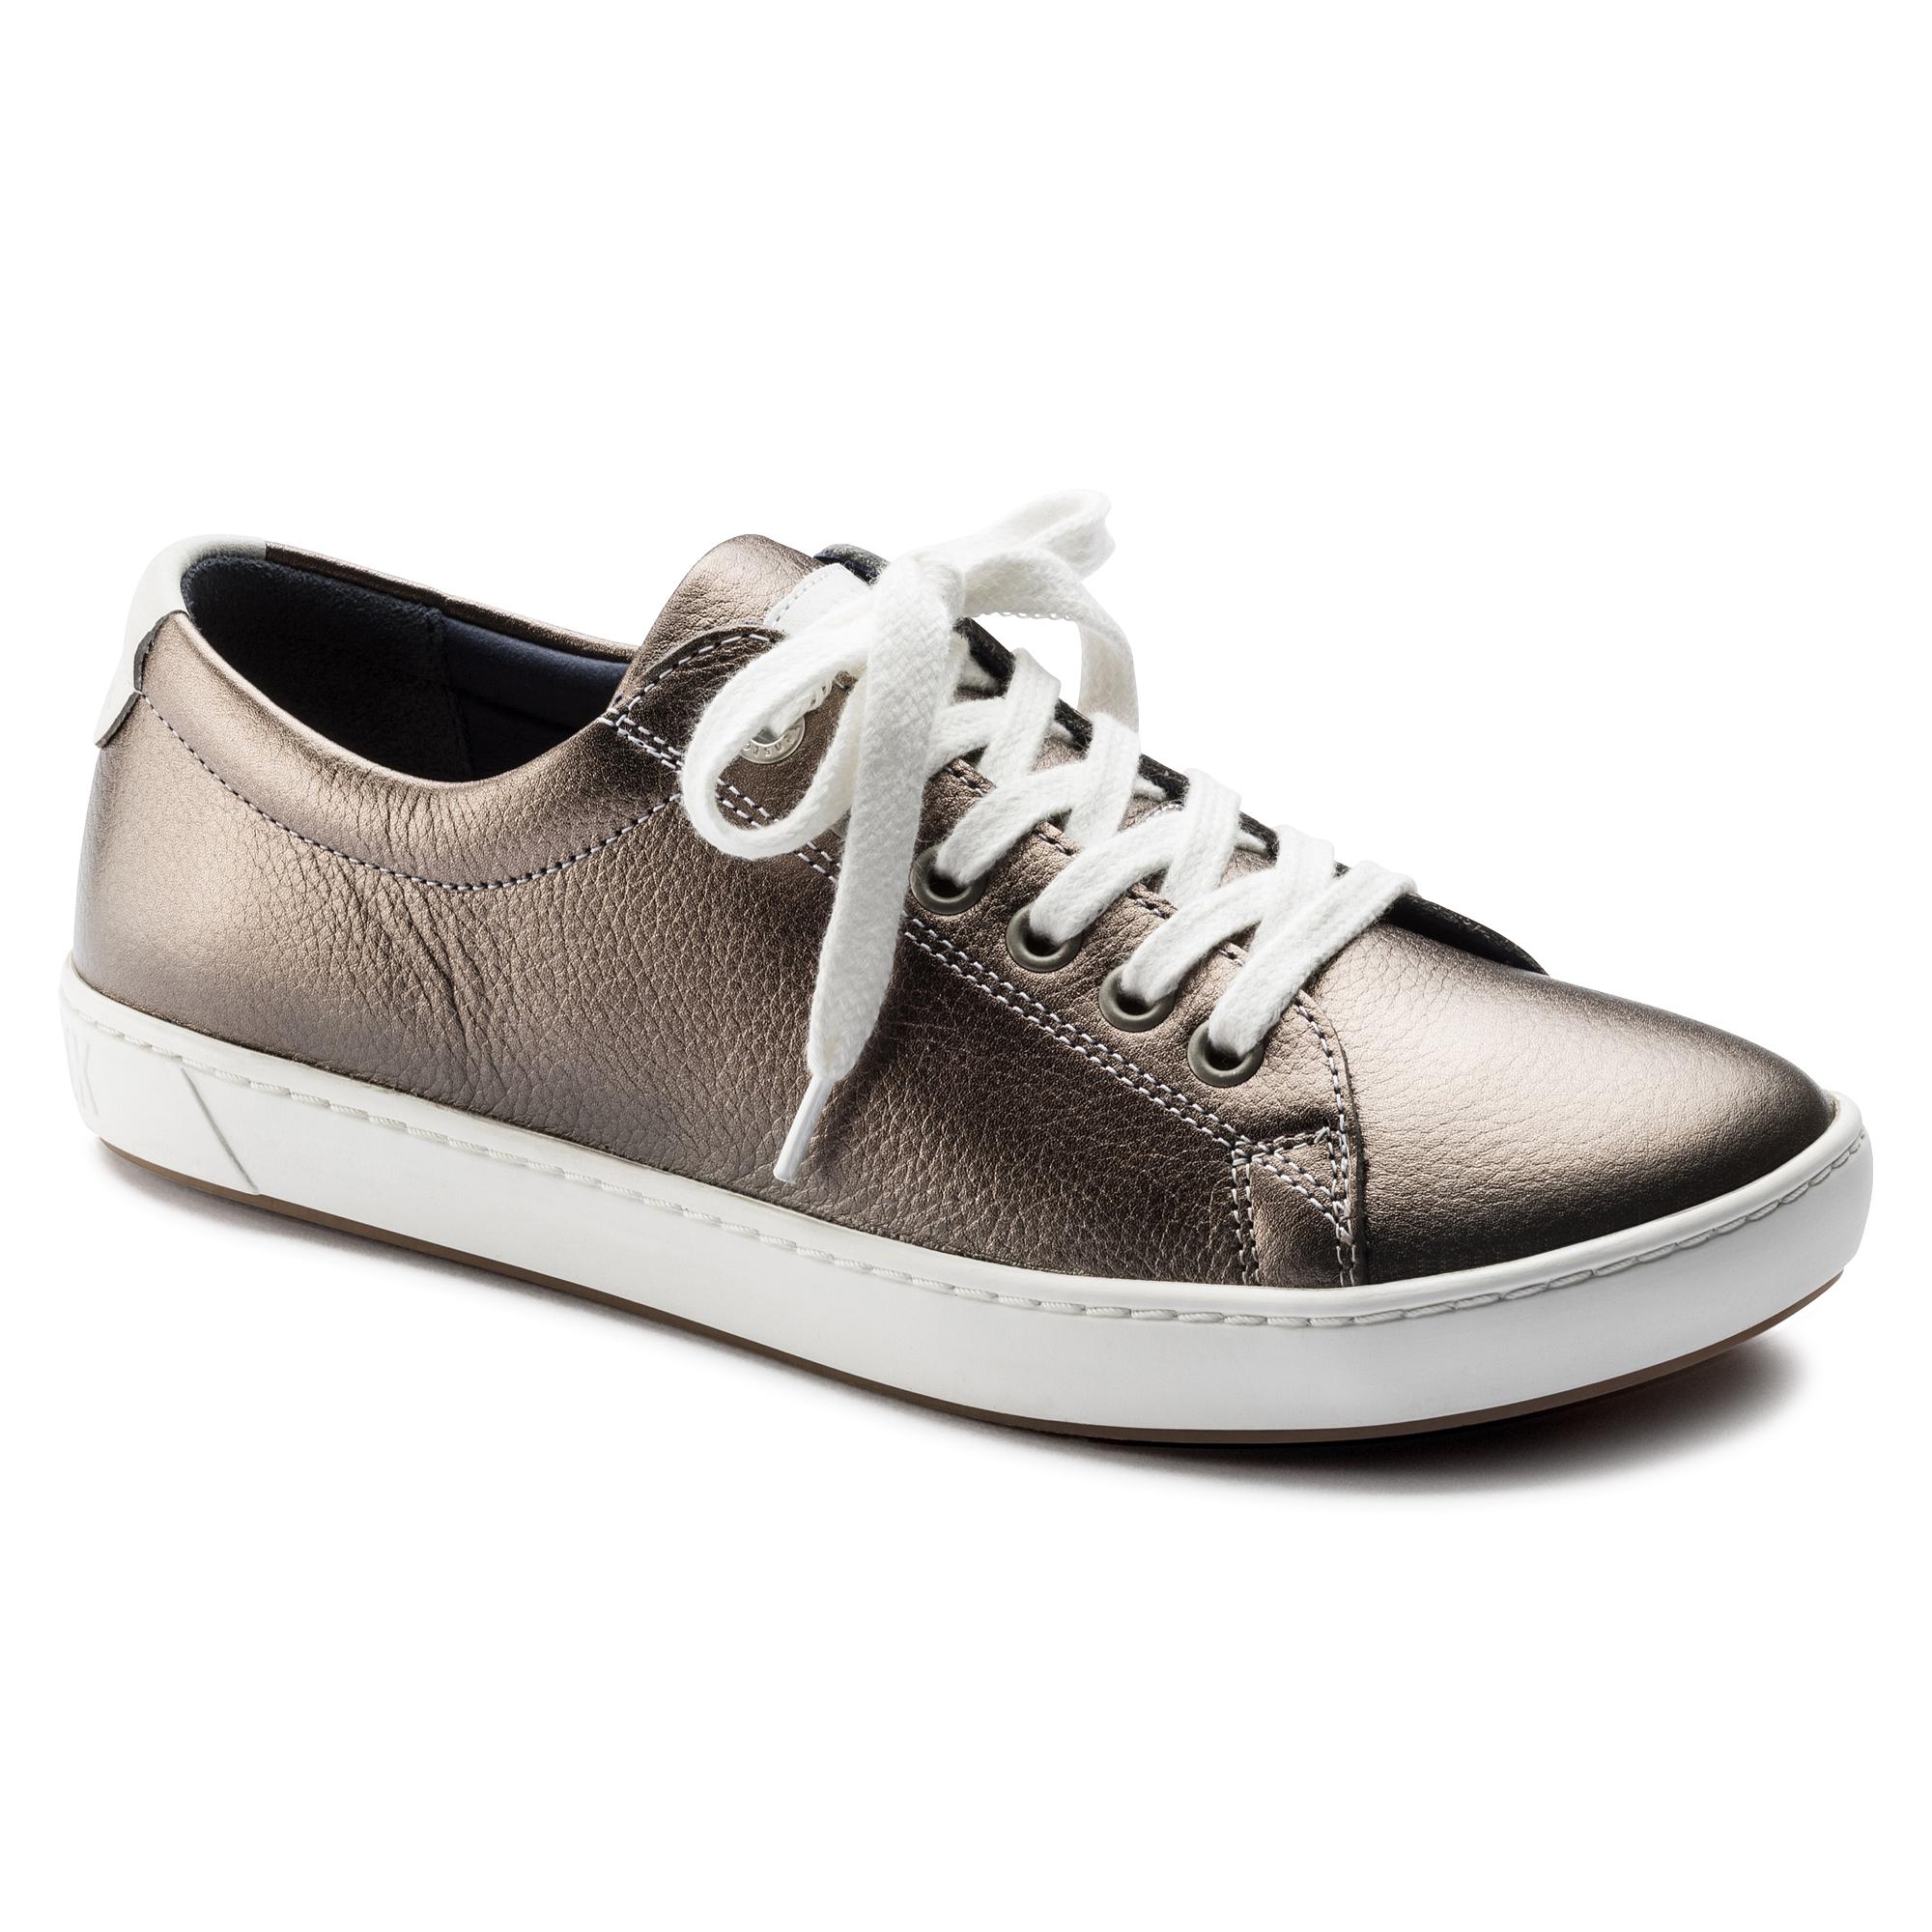 Birkenstock Arran Sneaker Pelle Naturale Scarpe da donna